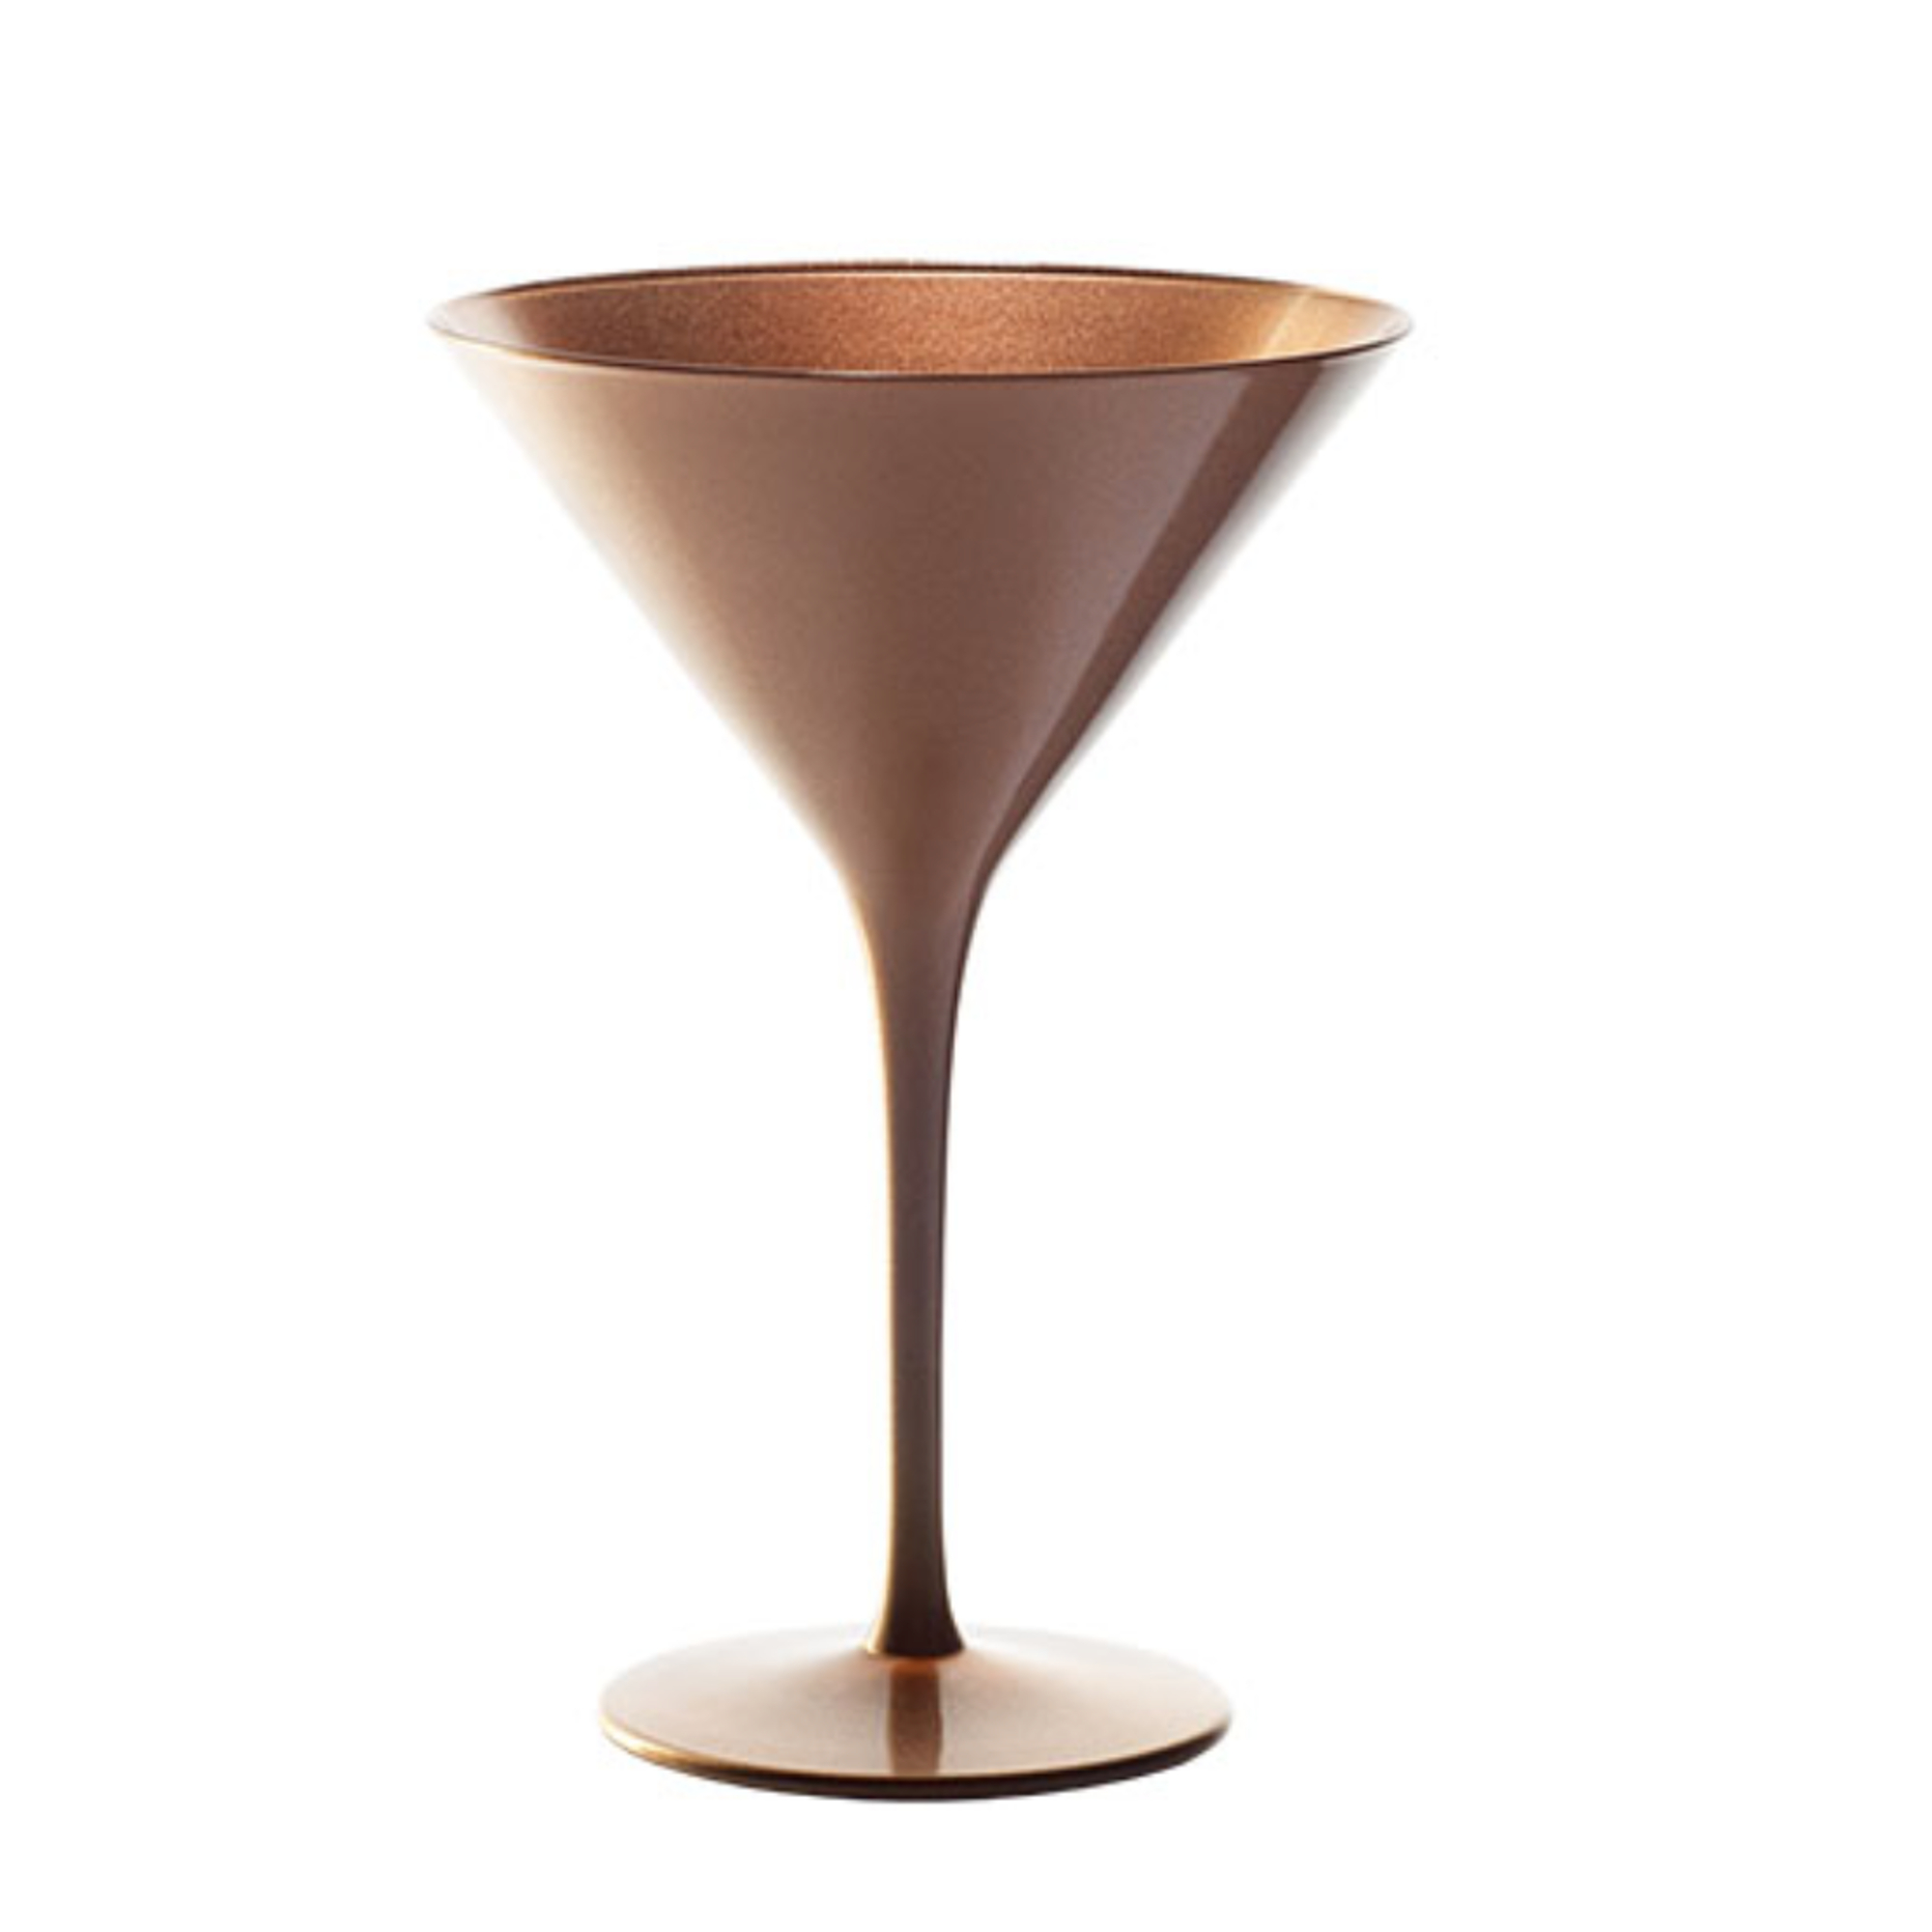 Stolzle Lausitz Bronze German Made Lead Free Crystal Martini Glass, Set of 6